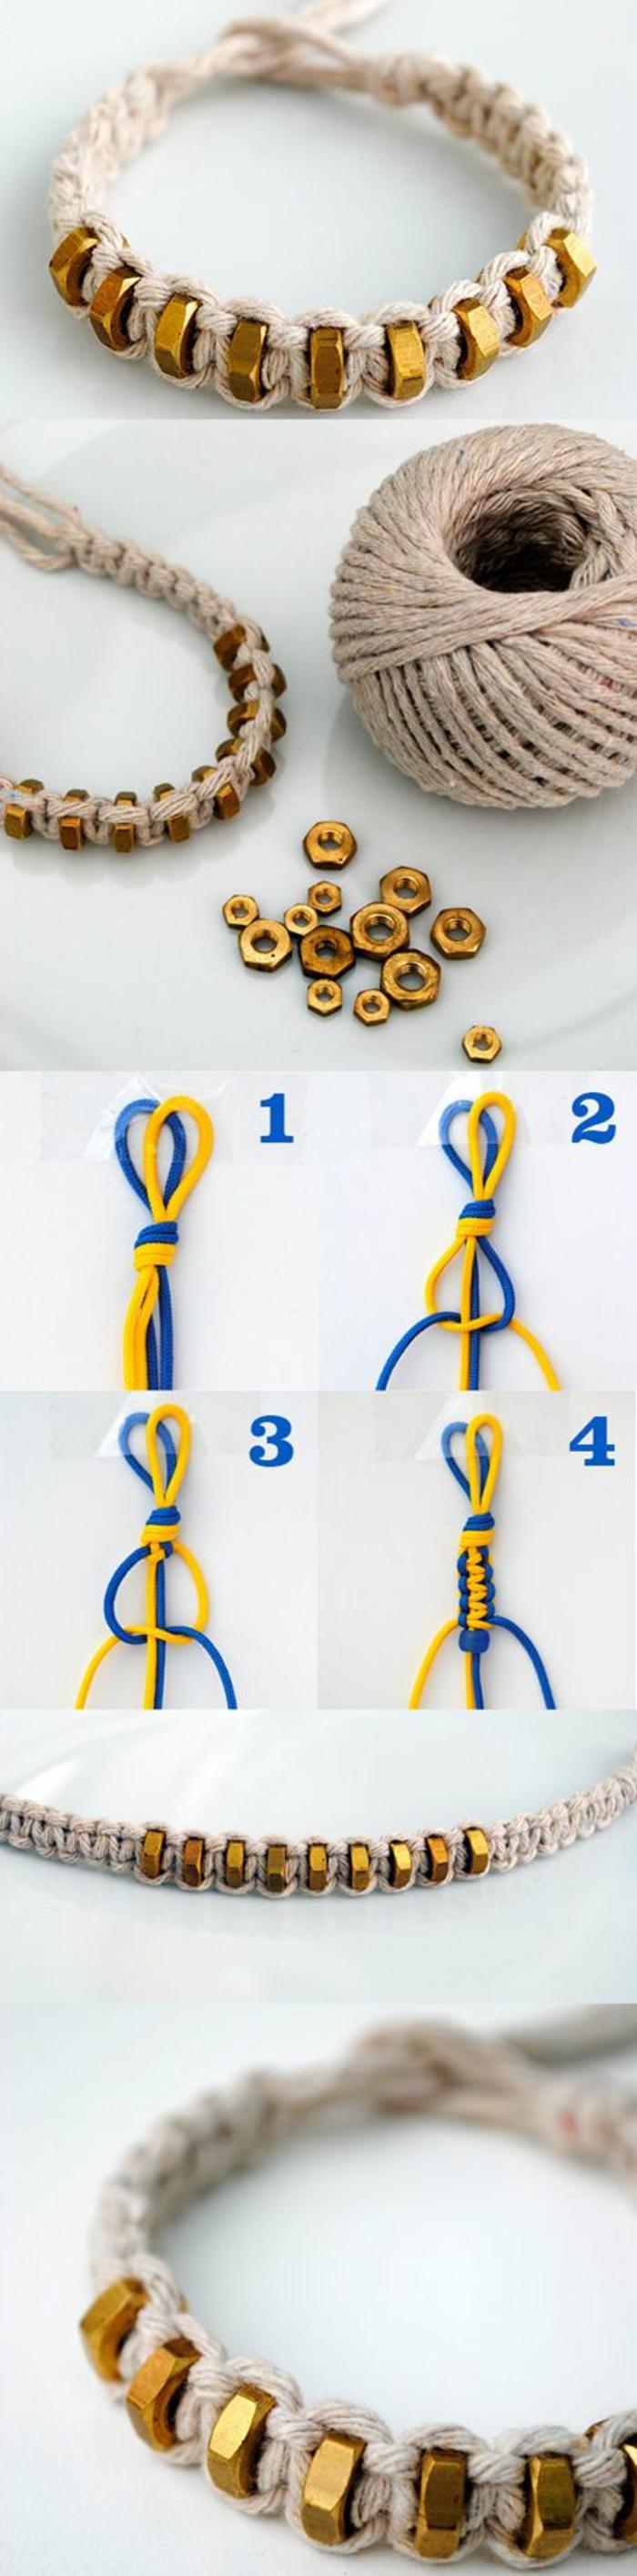 coole bastelideen, armband aus leinenschnur dekoriert mit goldenen elementen